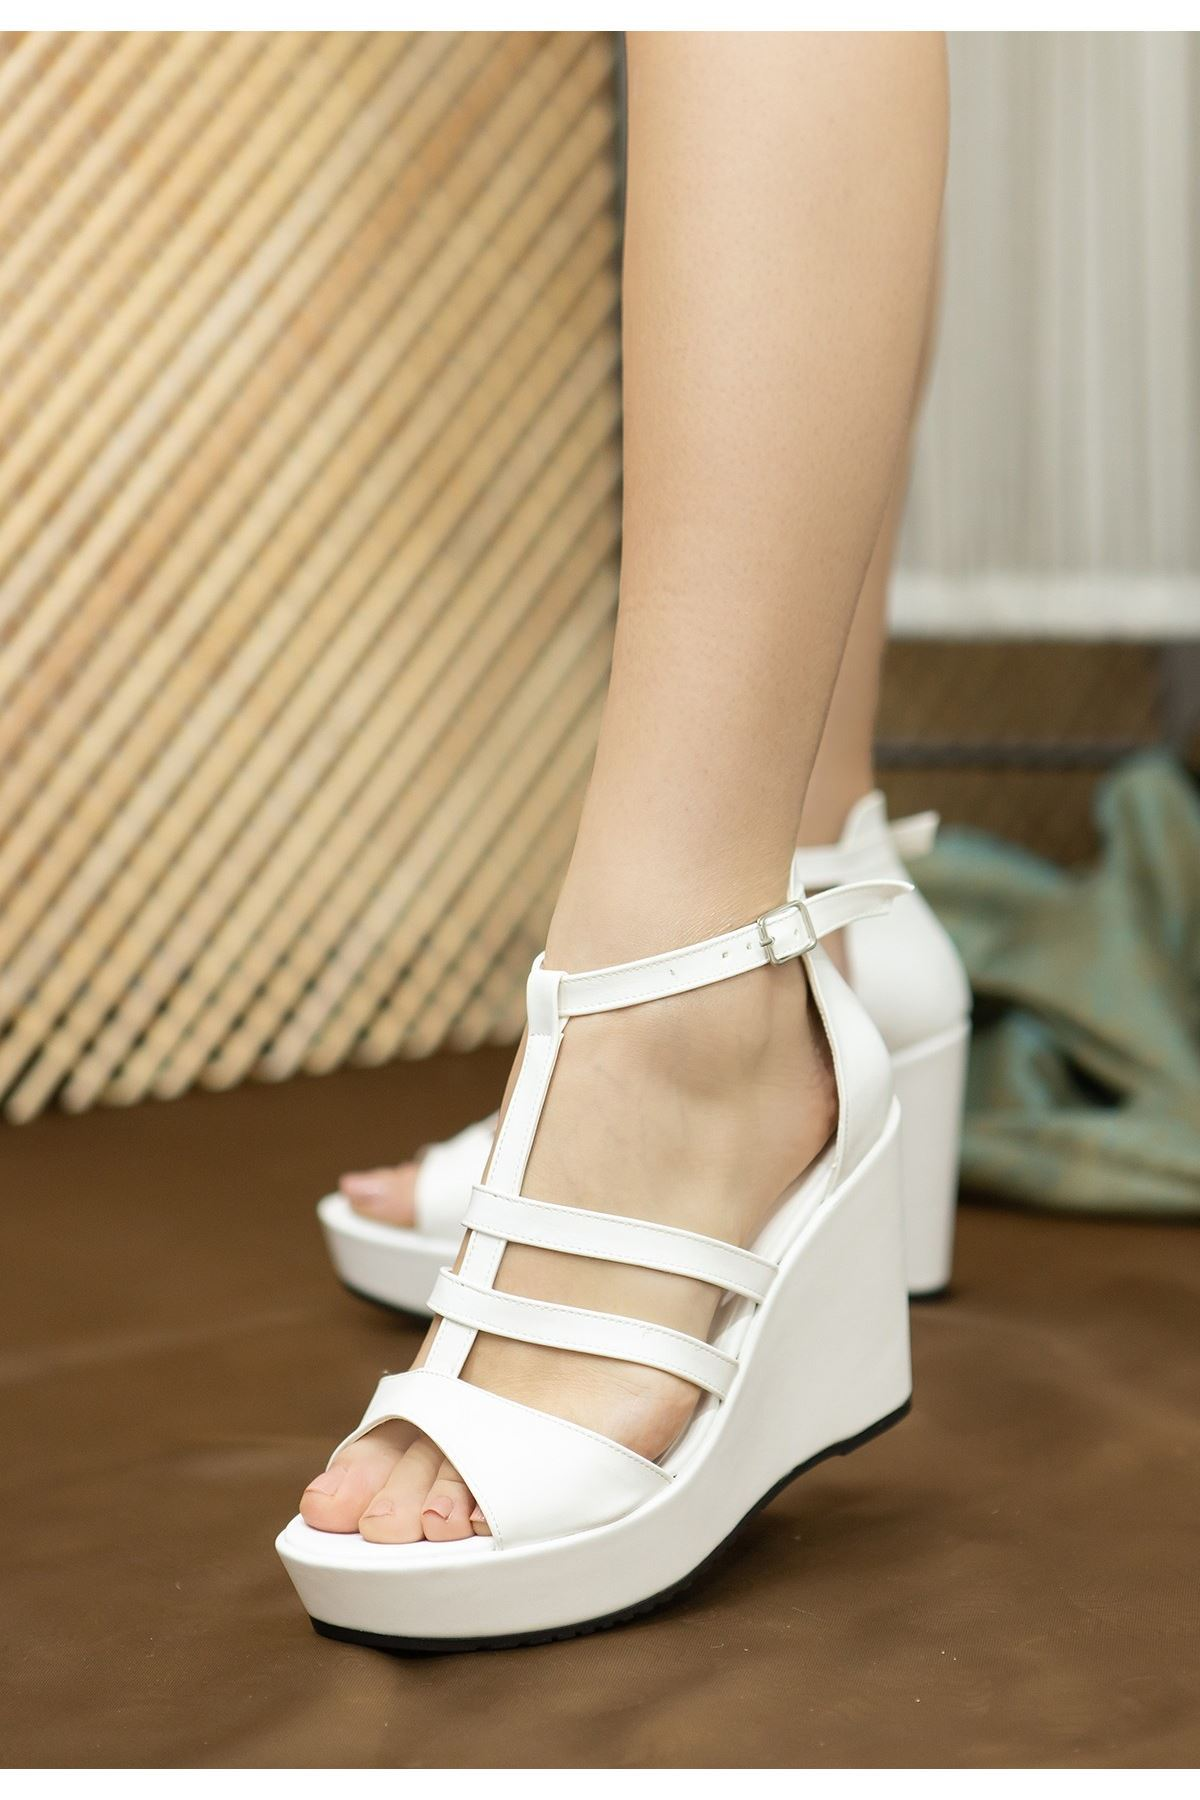 Iren Beyaz Cilt Dolgu Topuk Sandalet